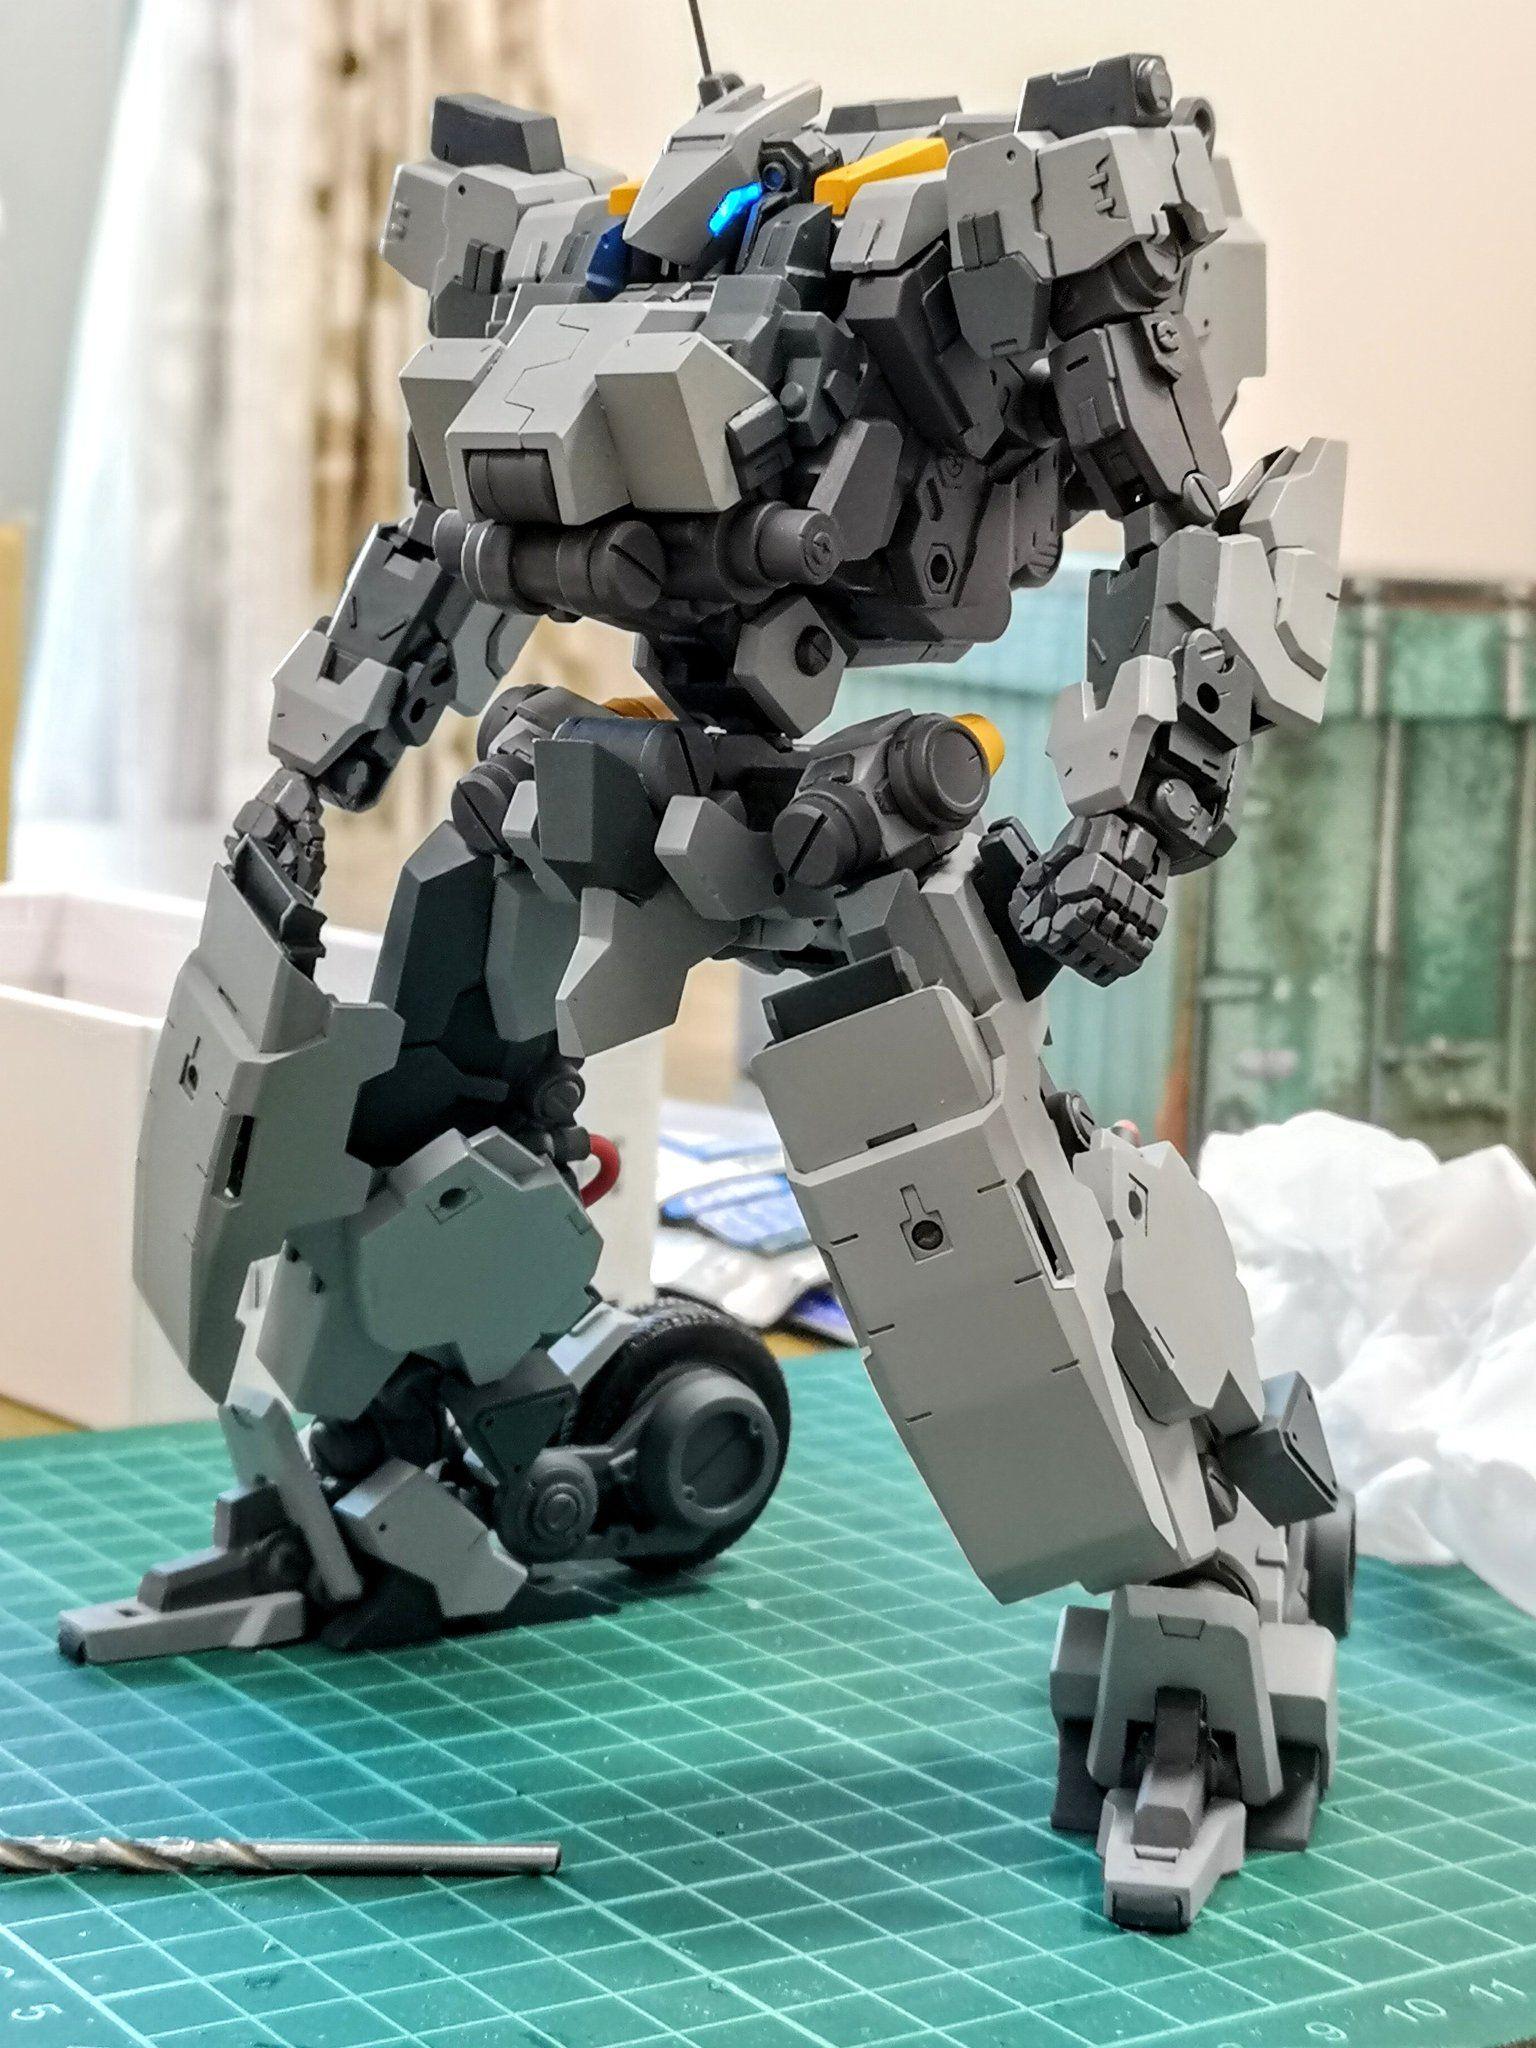 Spielzeug Kampfroboter